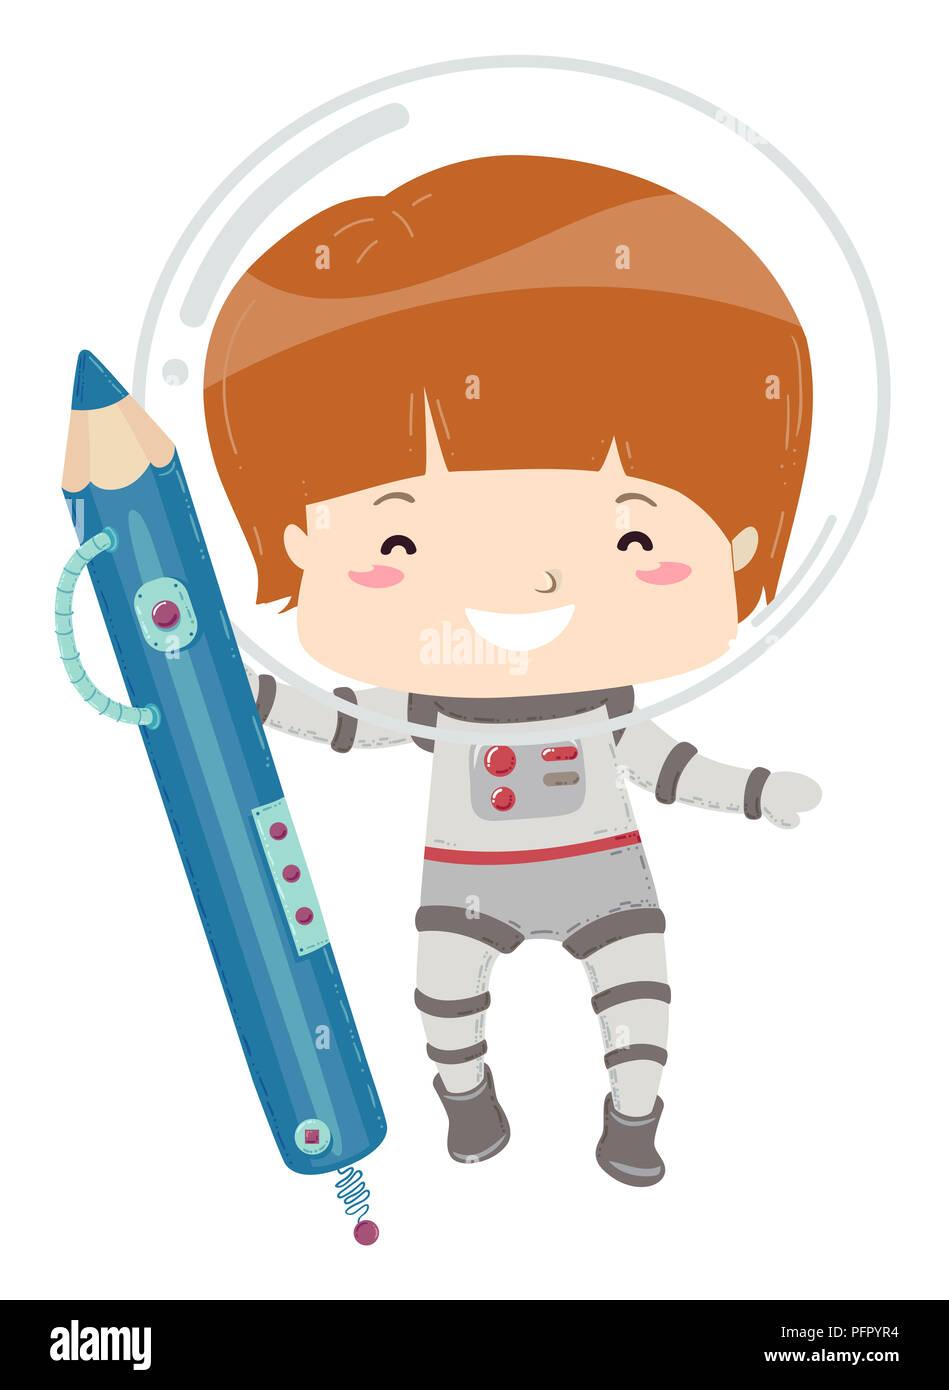 astronaut costume stockfotos astronaut costume bilder. Black Bedroom Furniture Sets. Home Design Ideas